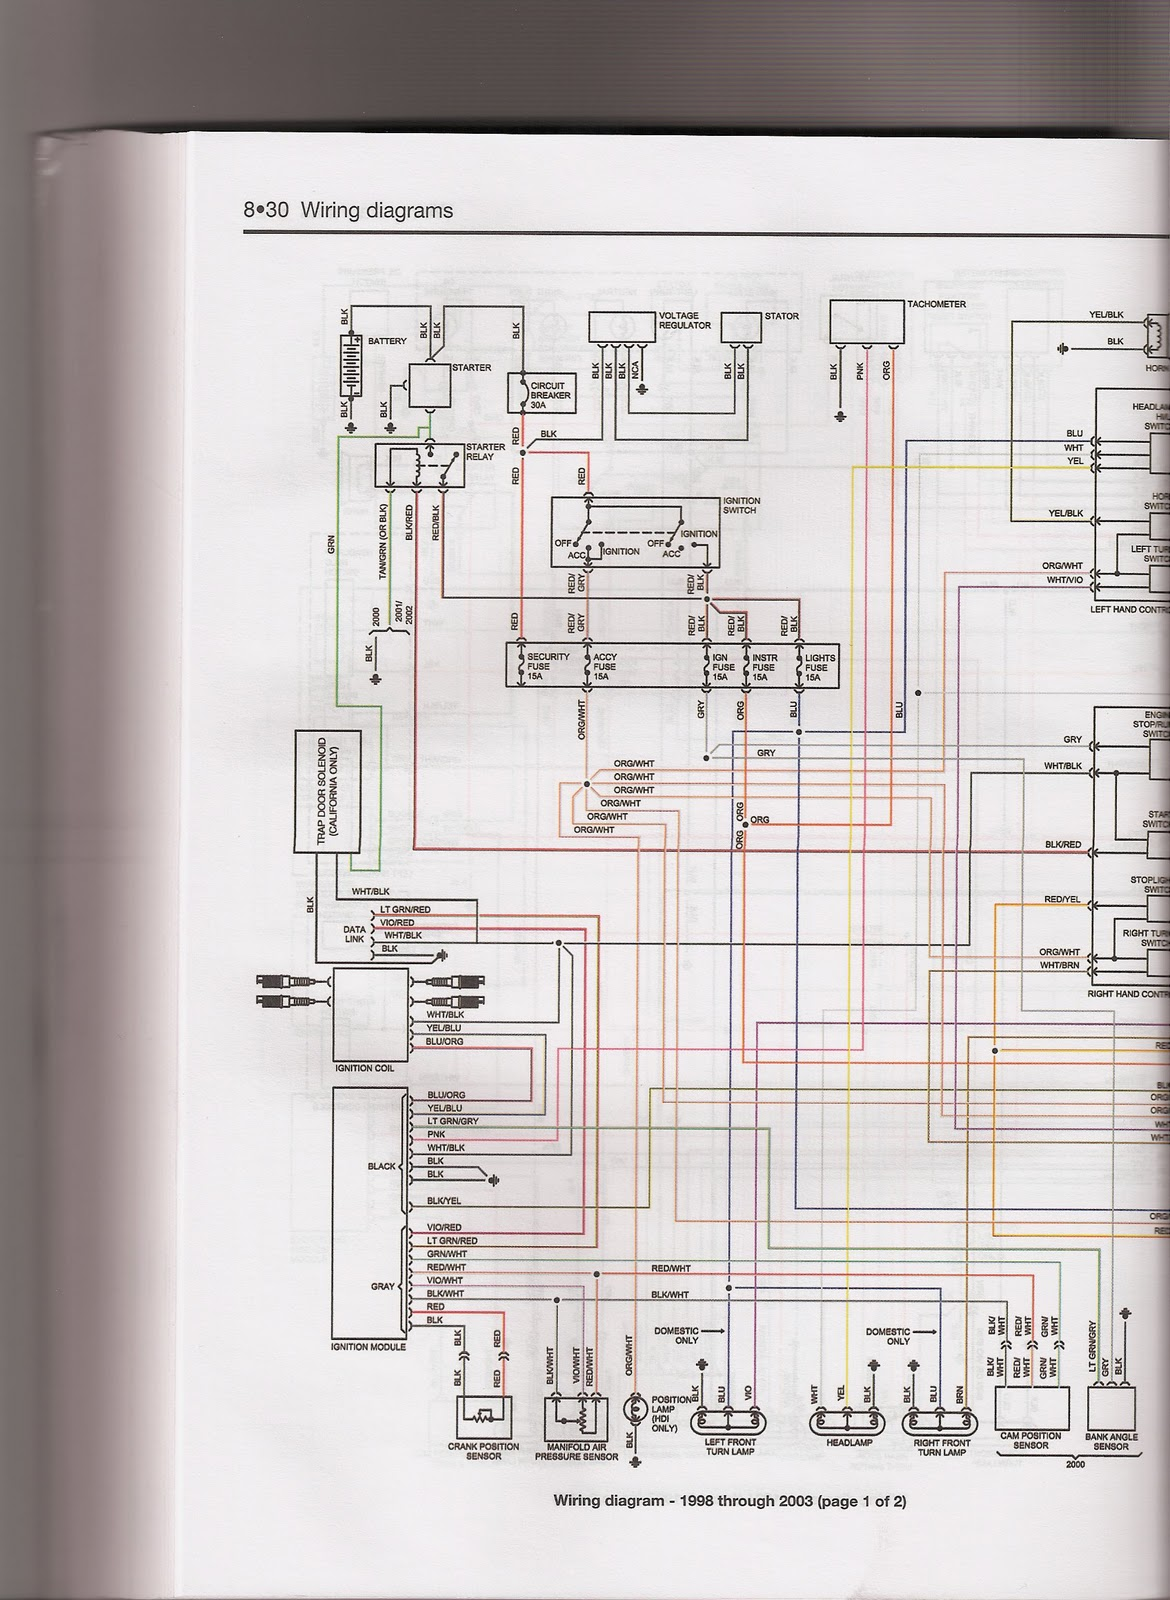 98 sportster wiring diagram reveolution of wiring diagram u2022 1986 harley sportster 883 wiring diagram [ 1170 x 1600 Pixel ]